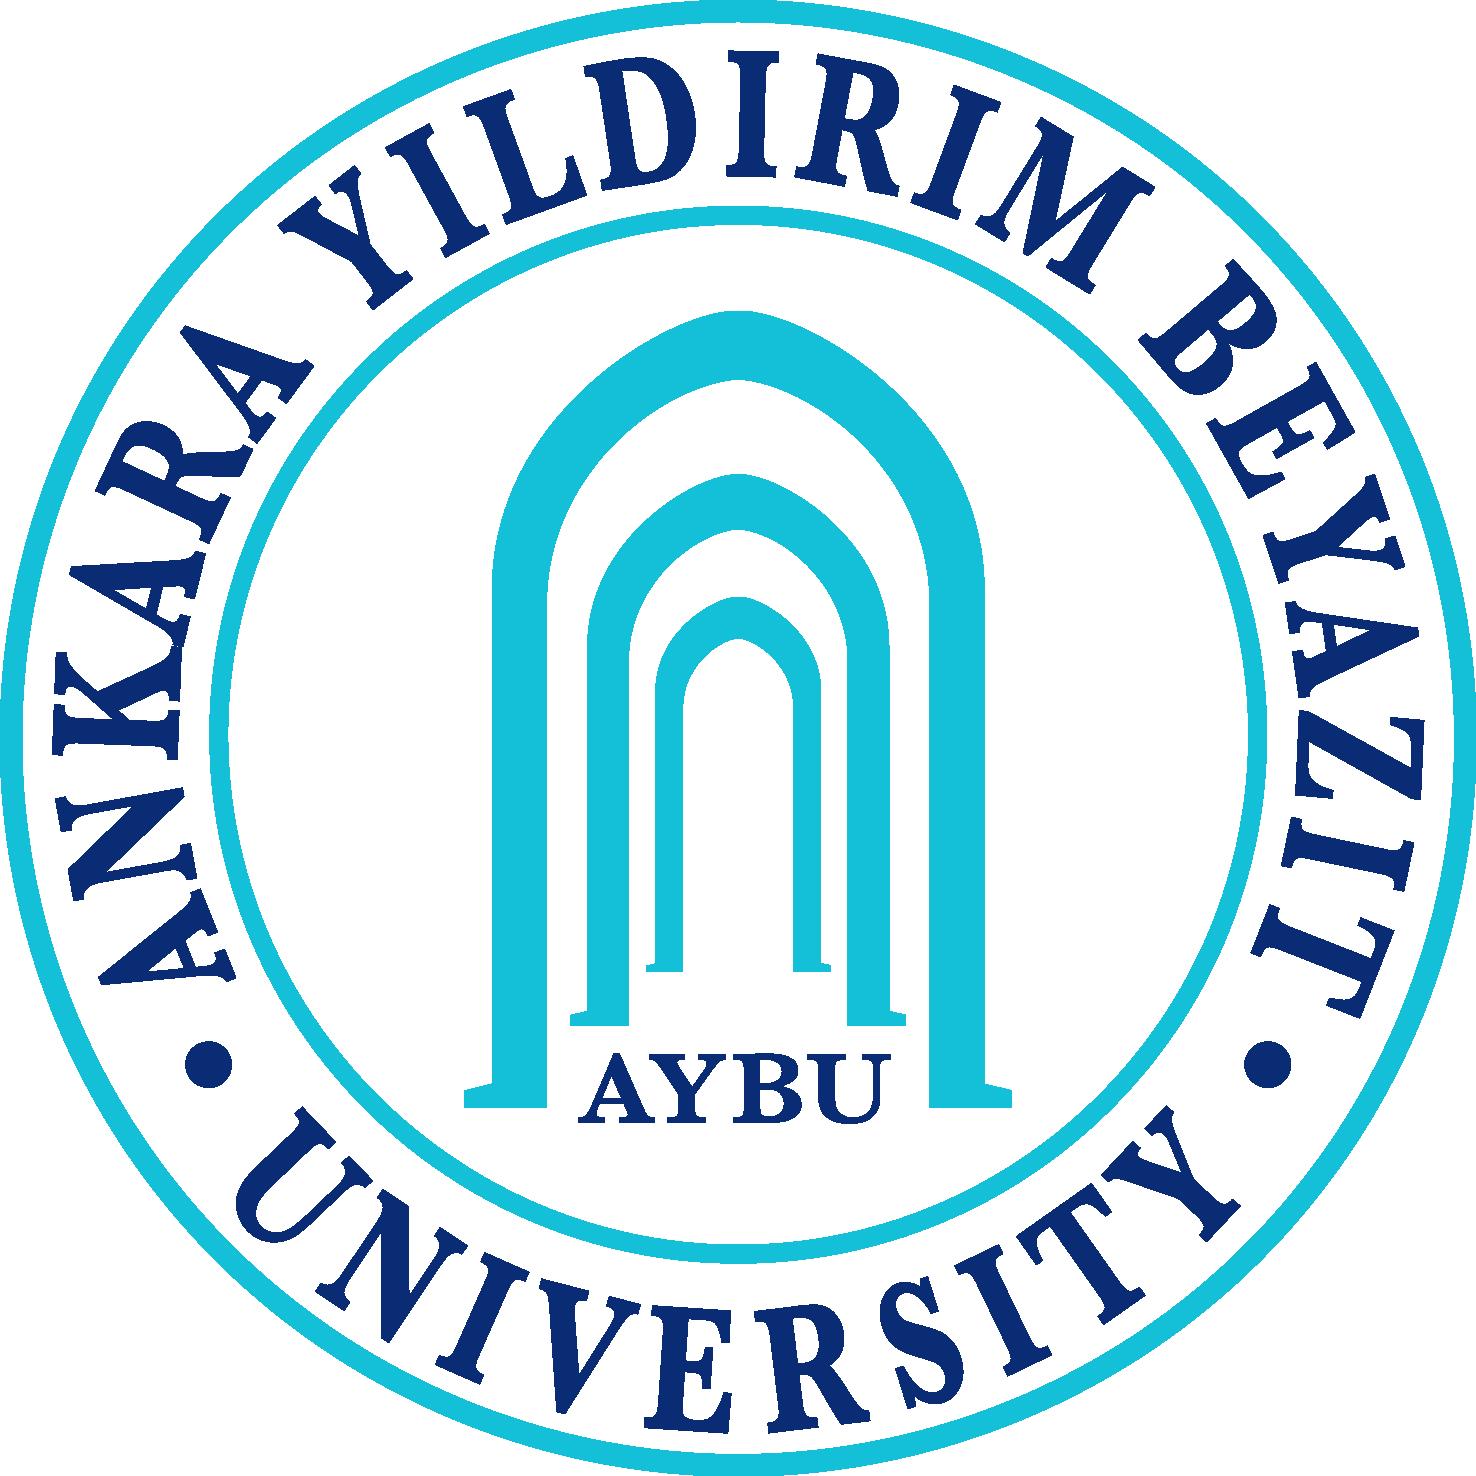 Ankara Yıldırım Beyazıt University-Ankara Yıldırım Beyazıt University-10